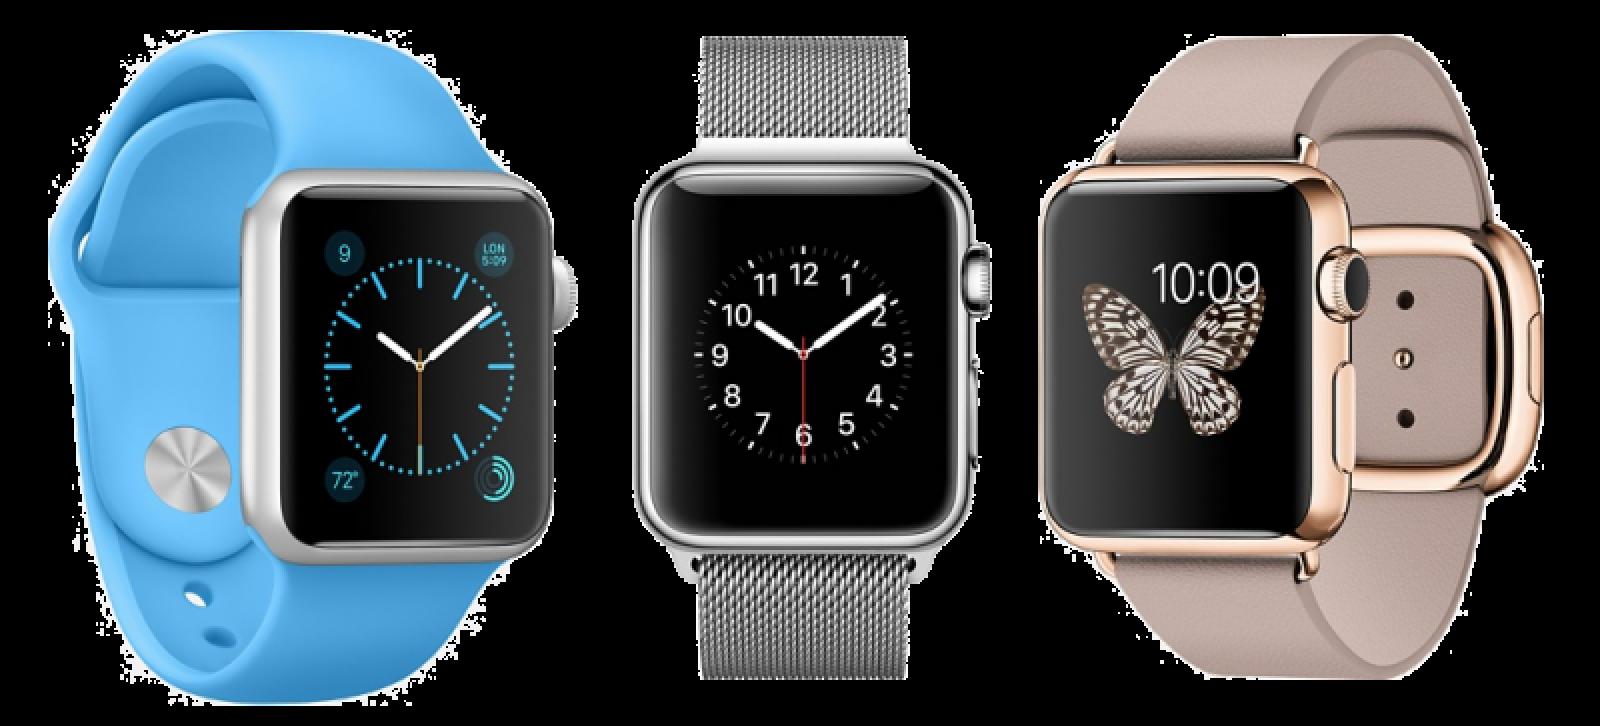 Apple Watch News